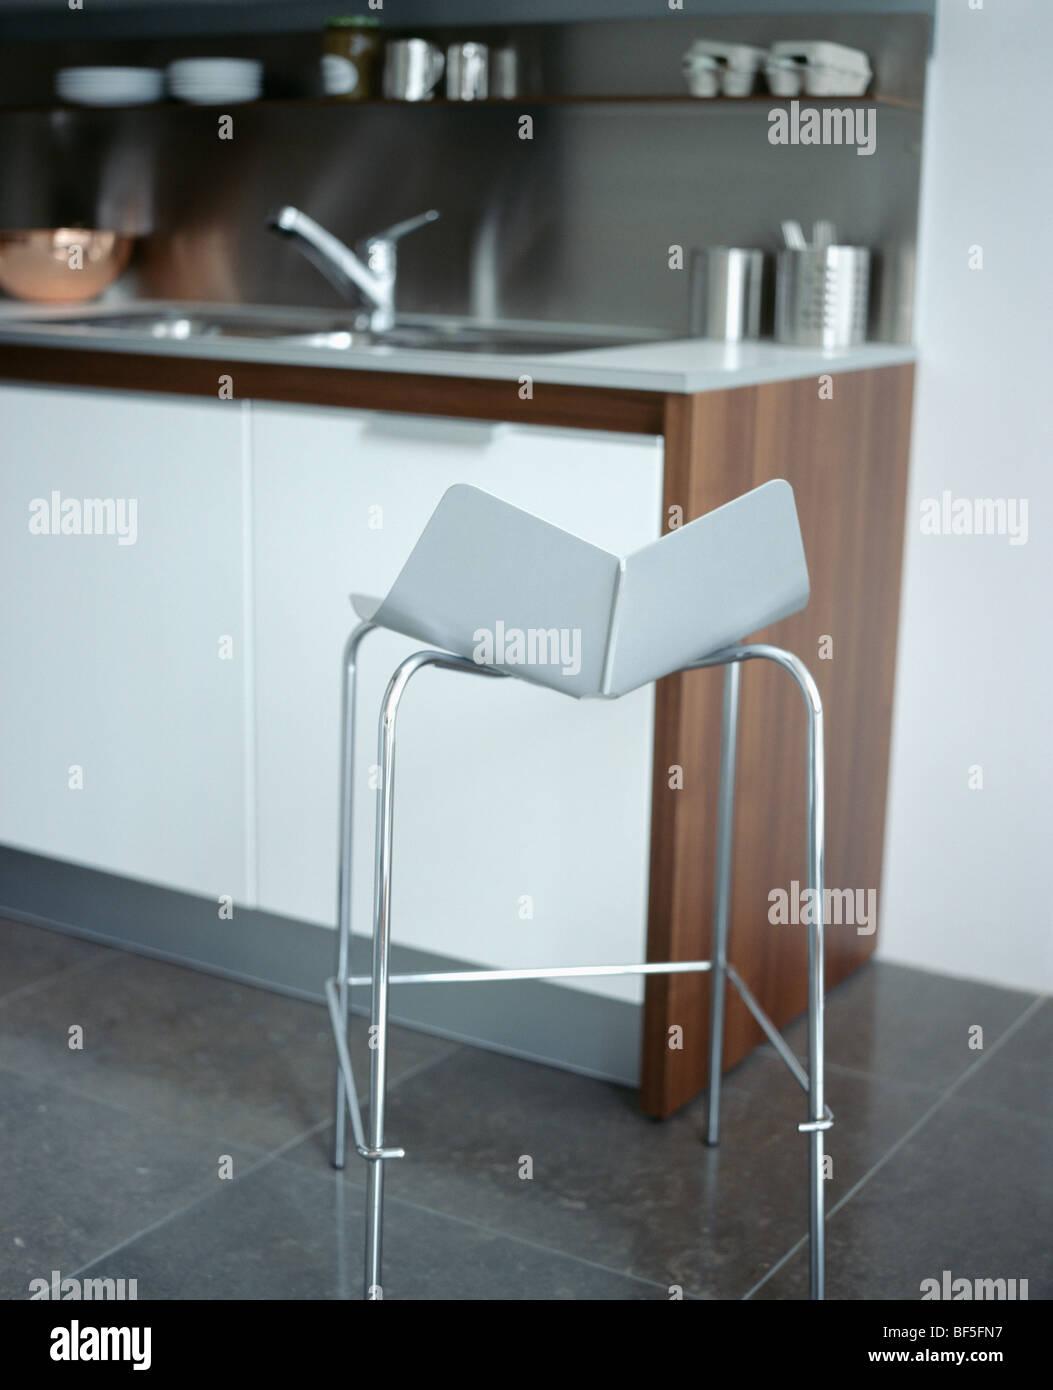 Kitchen Stool Furniture Monochromatic Stock Photos & Kitchen Stool ...